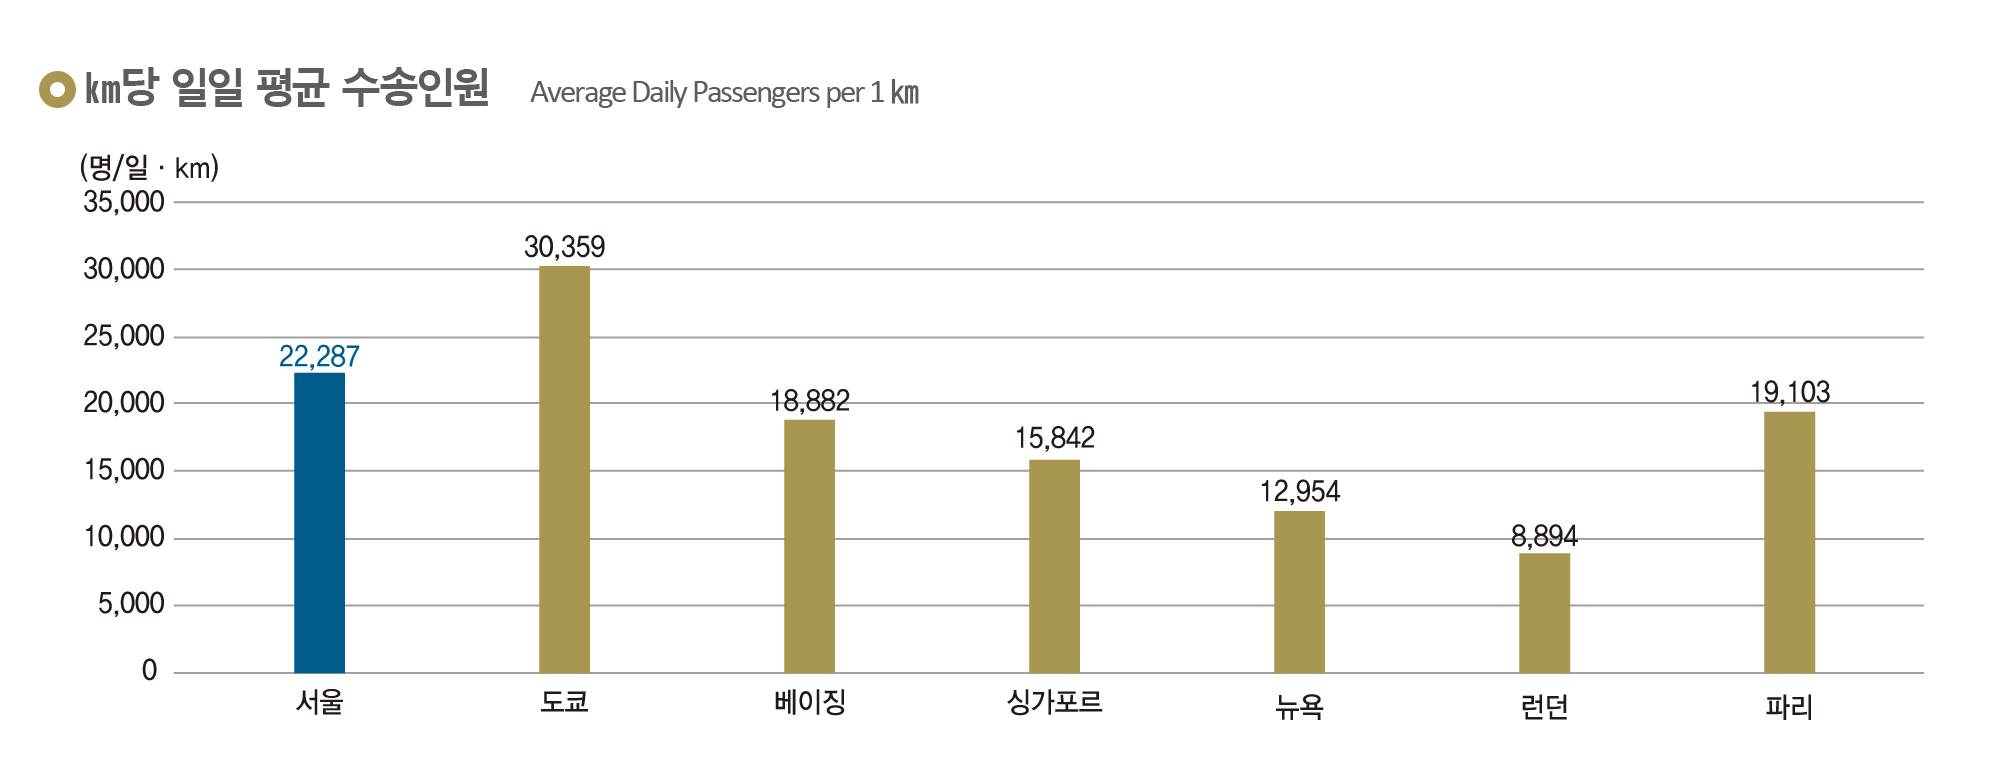 km당 일일 평균 수송인원